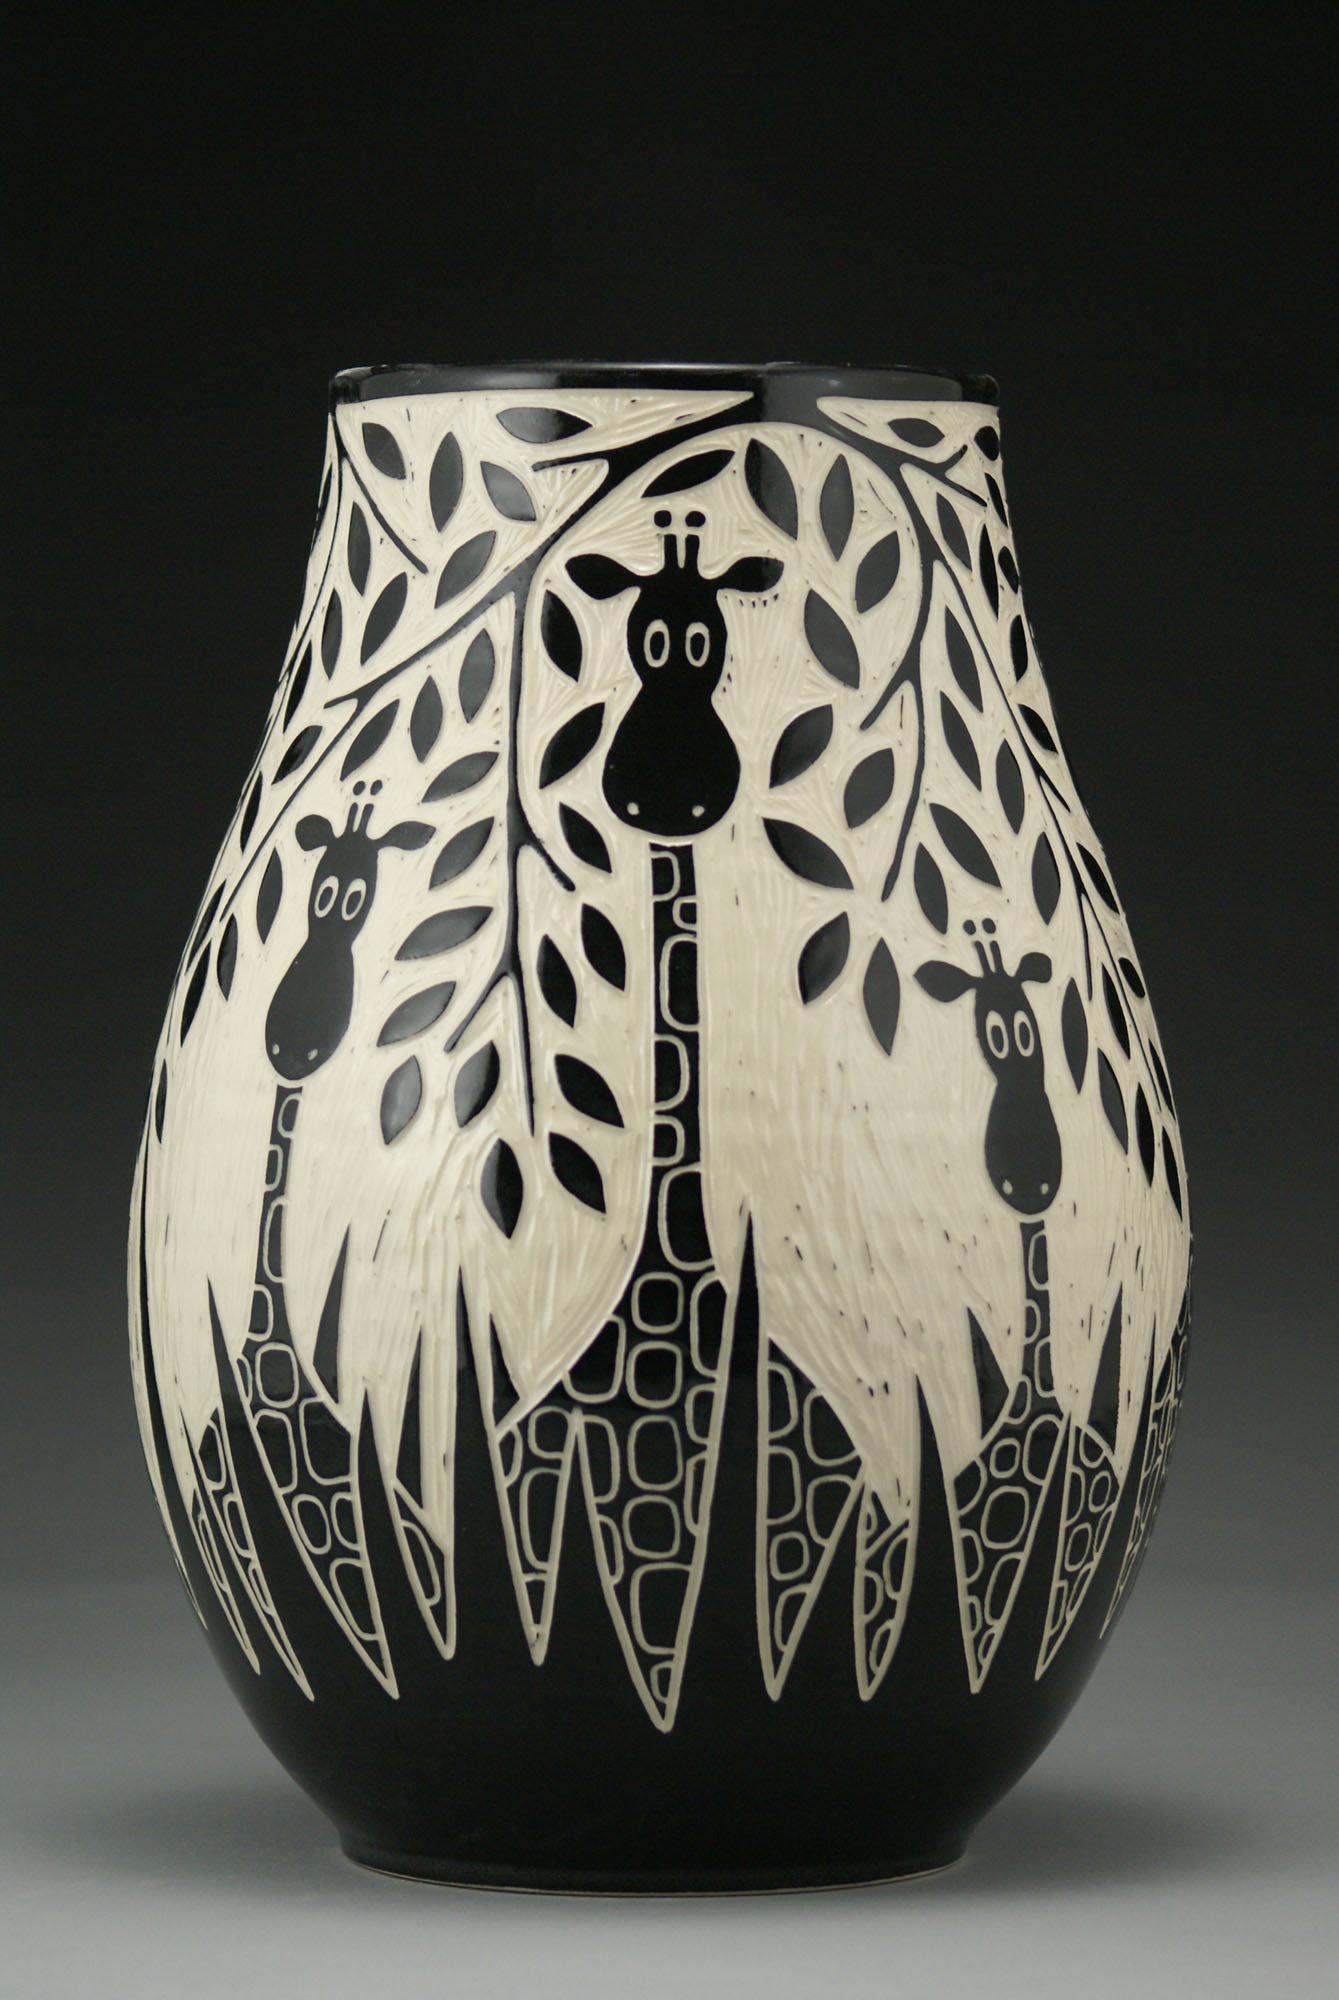 Giraffes In The Wild by Jennifer Falter Ceramic Vase